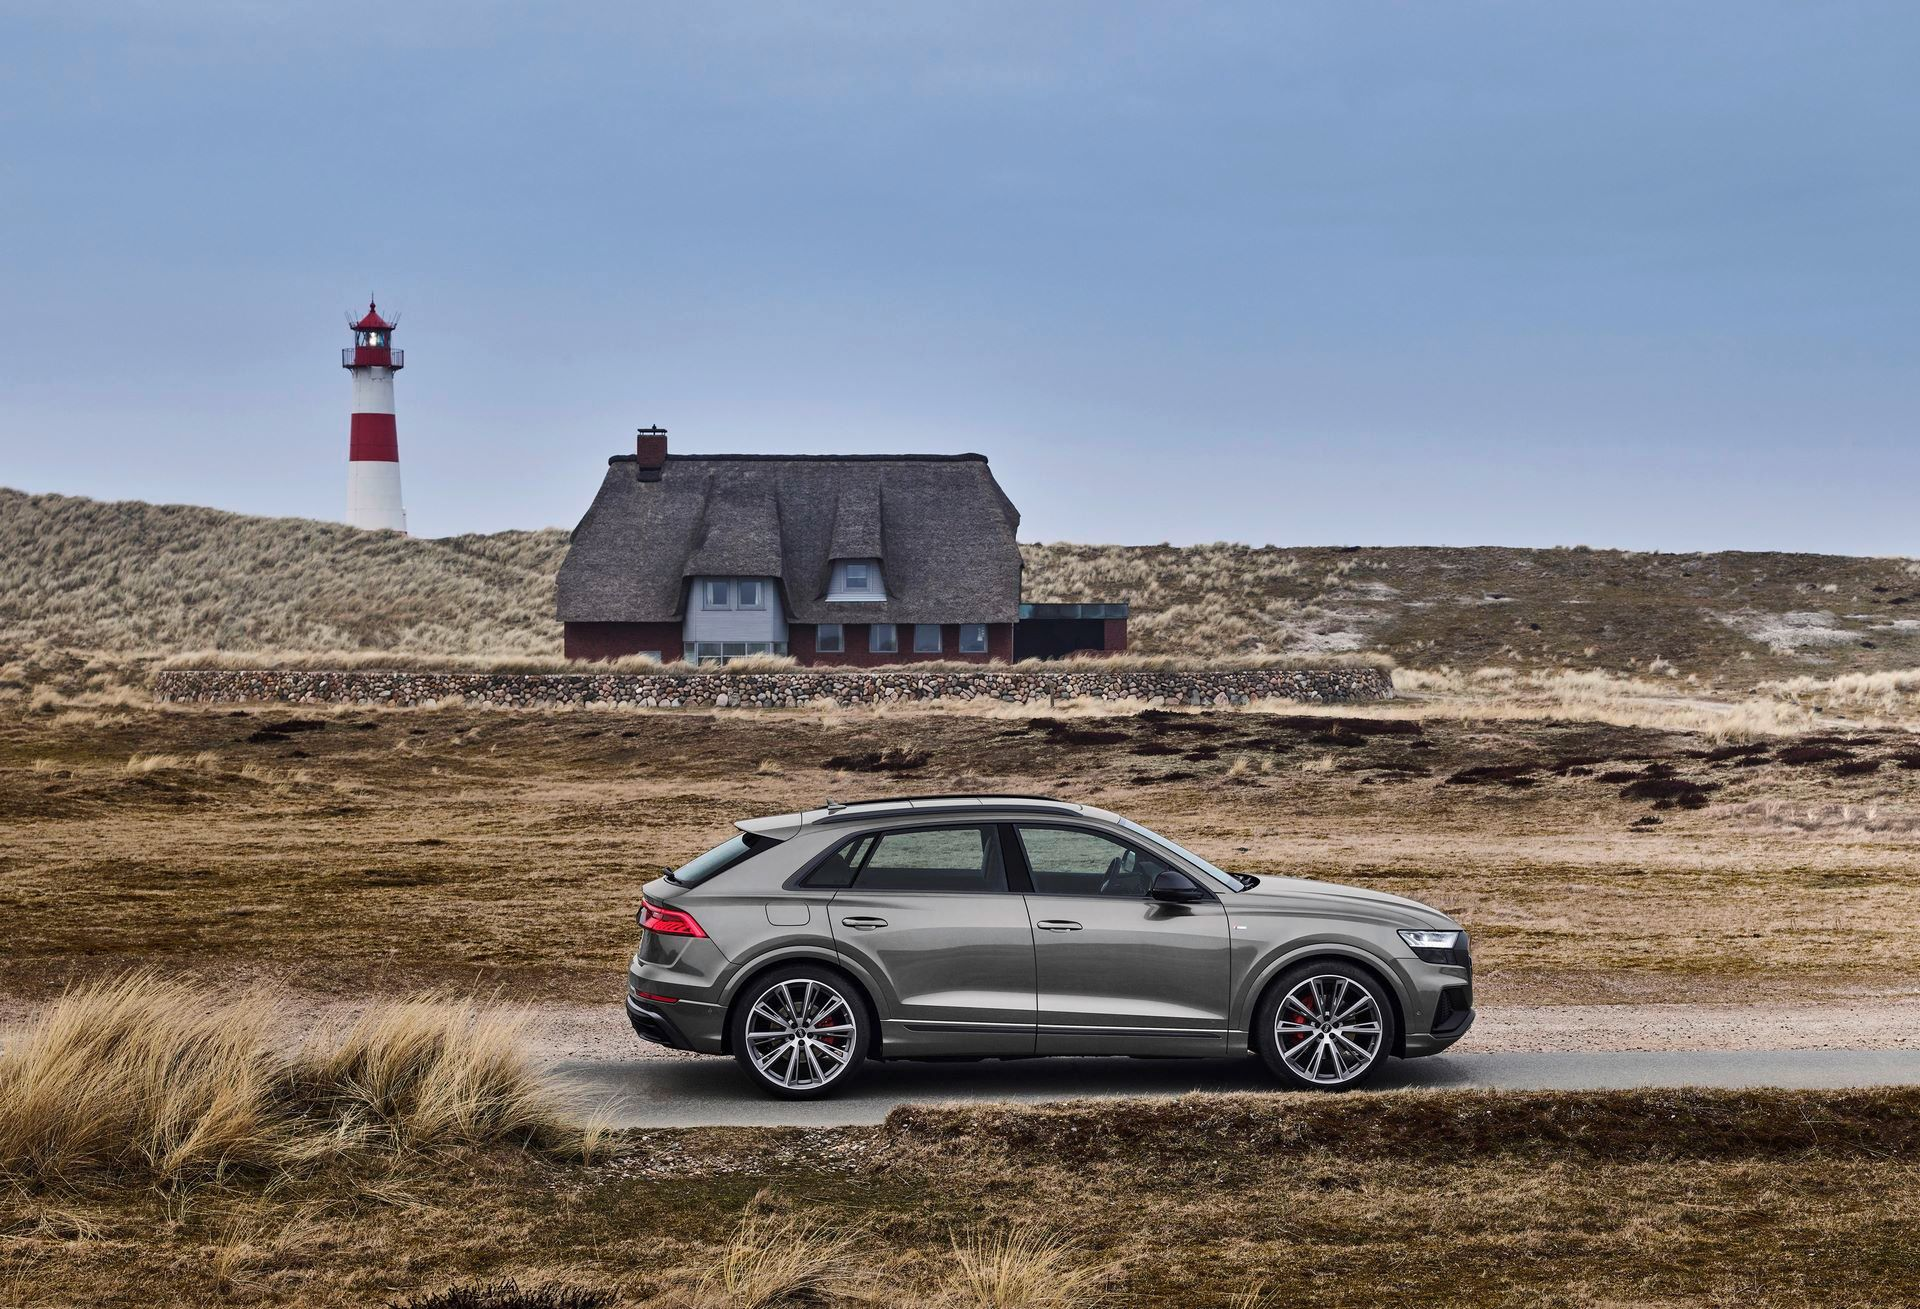 Audi-A4-A5-Q7-Q8-Competition-And-Competition-Plus-Trims-24